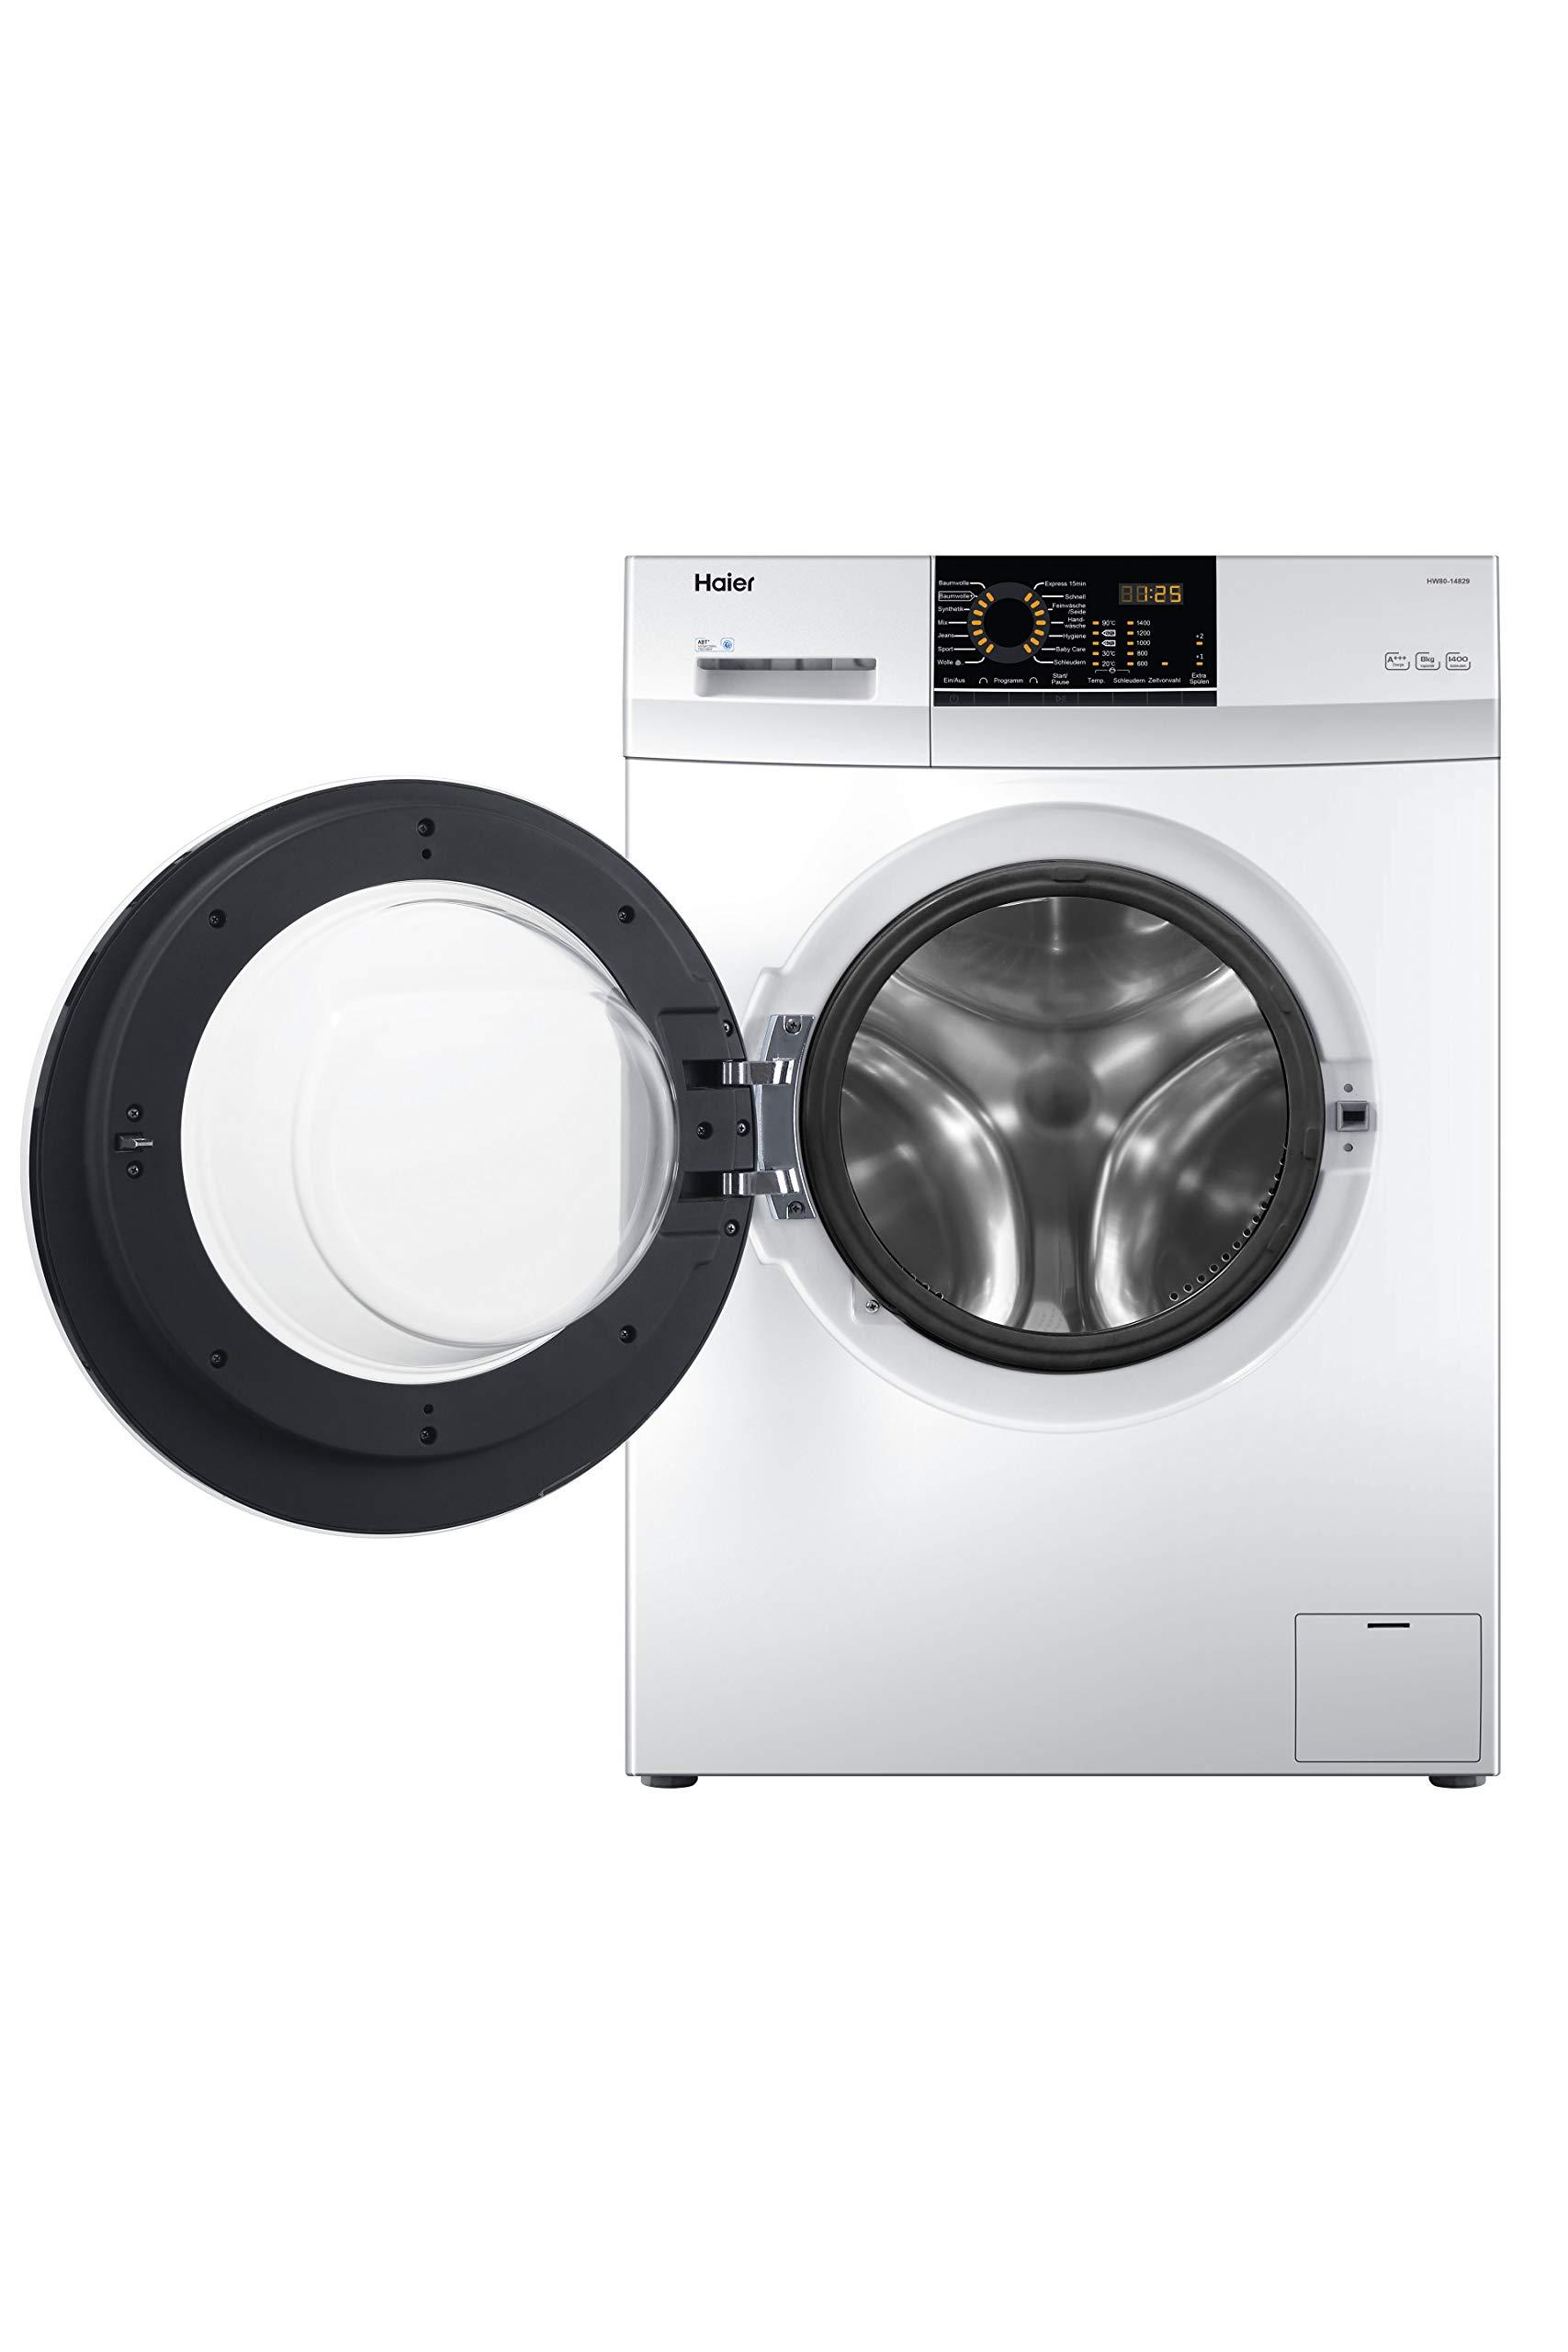 Haier-HW80-14829-Waschmaschine-Frontlader-8-kgA-1400-UpMABTAquaProtect